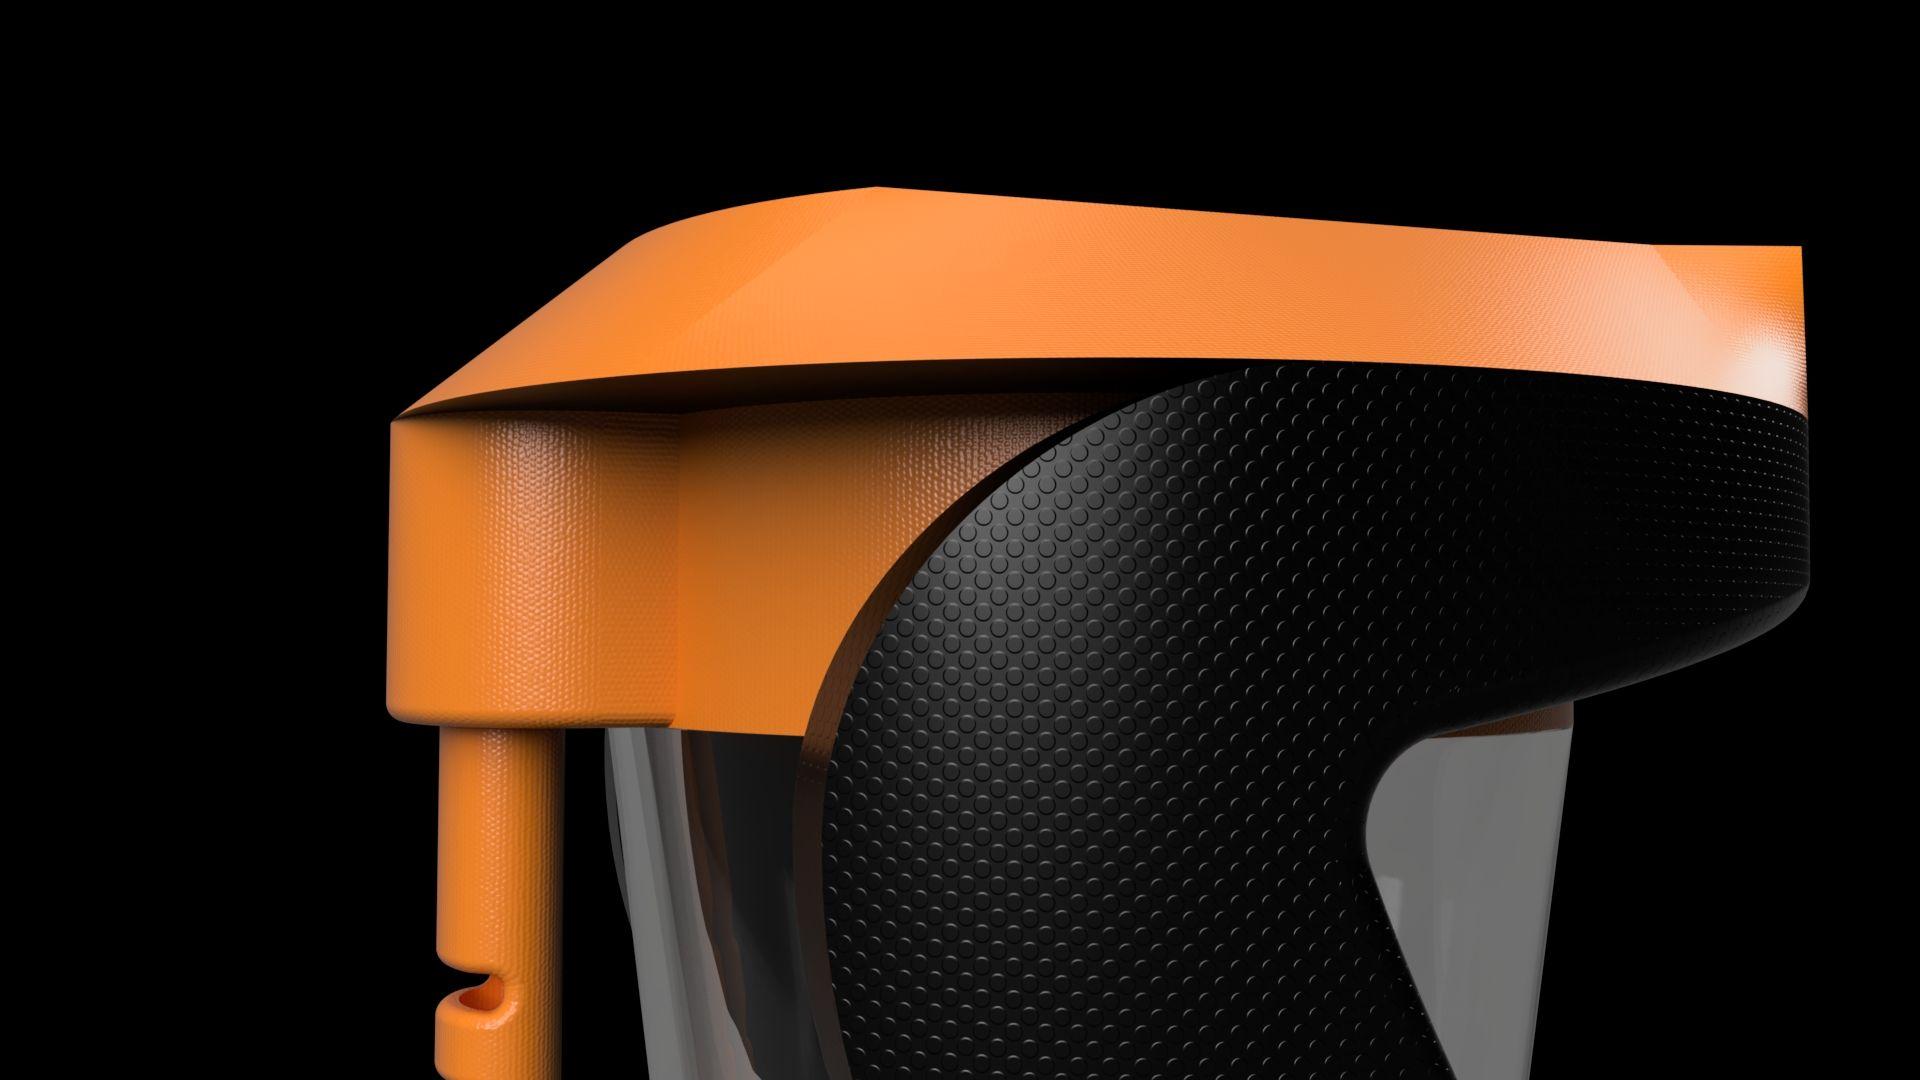 Liq-design-lcs2018-fabrica-de-nerdes-3-3500-3500